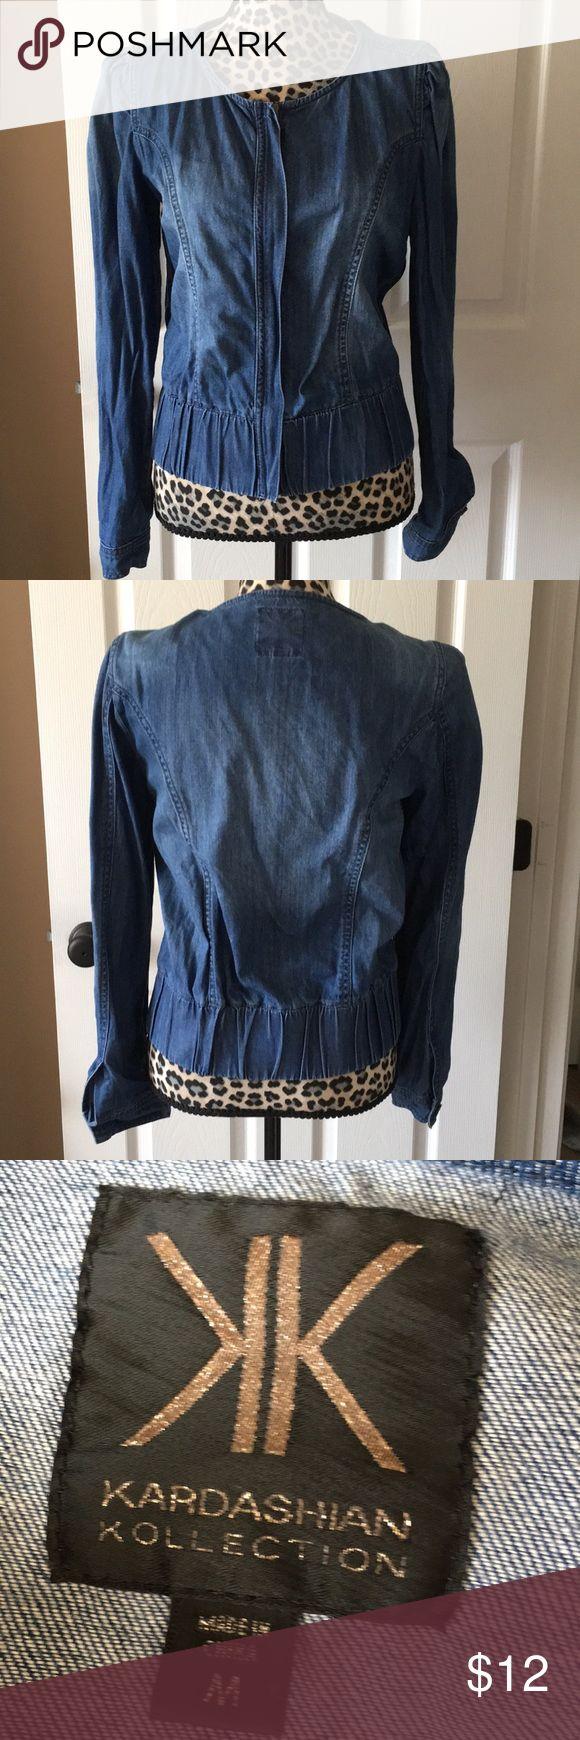 Kardashian Kollection Denim Zip Up Jacket Size M Womens Kardashian Kollection Denim Zip Up Jacket Size Medium. Excellent Condtion, no flaws. Kardashian Kollection Jackets & Coats